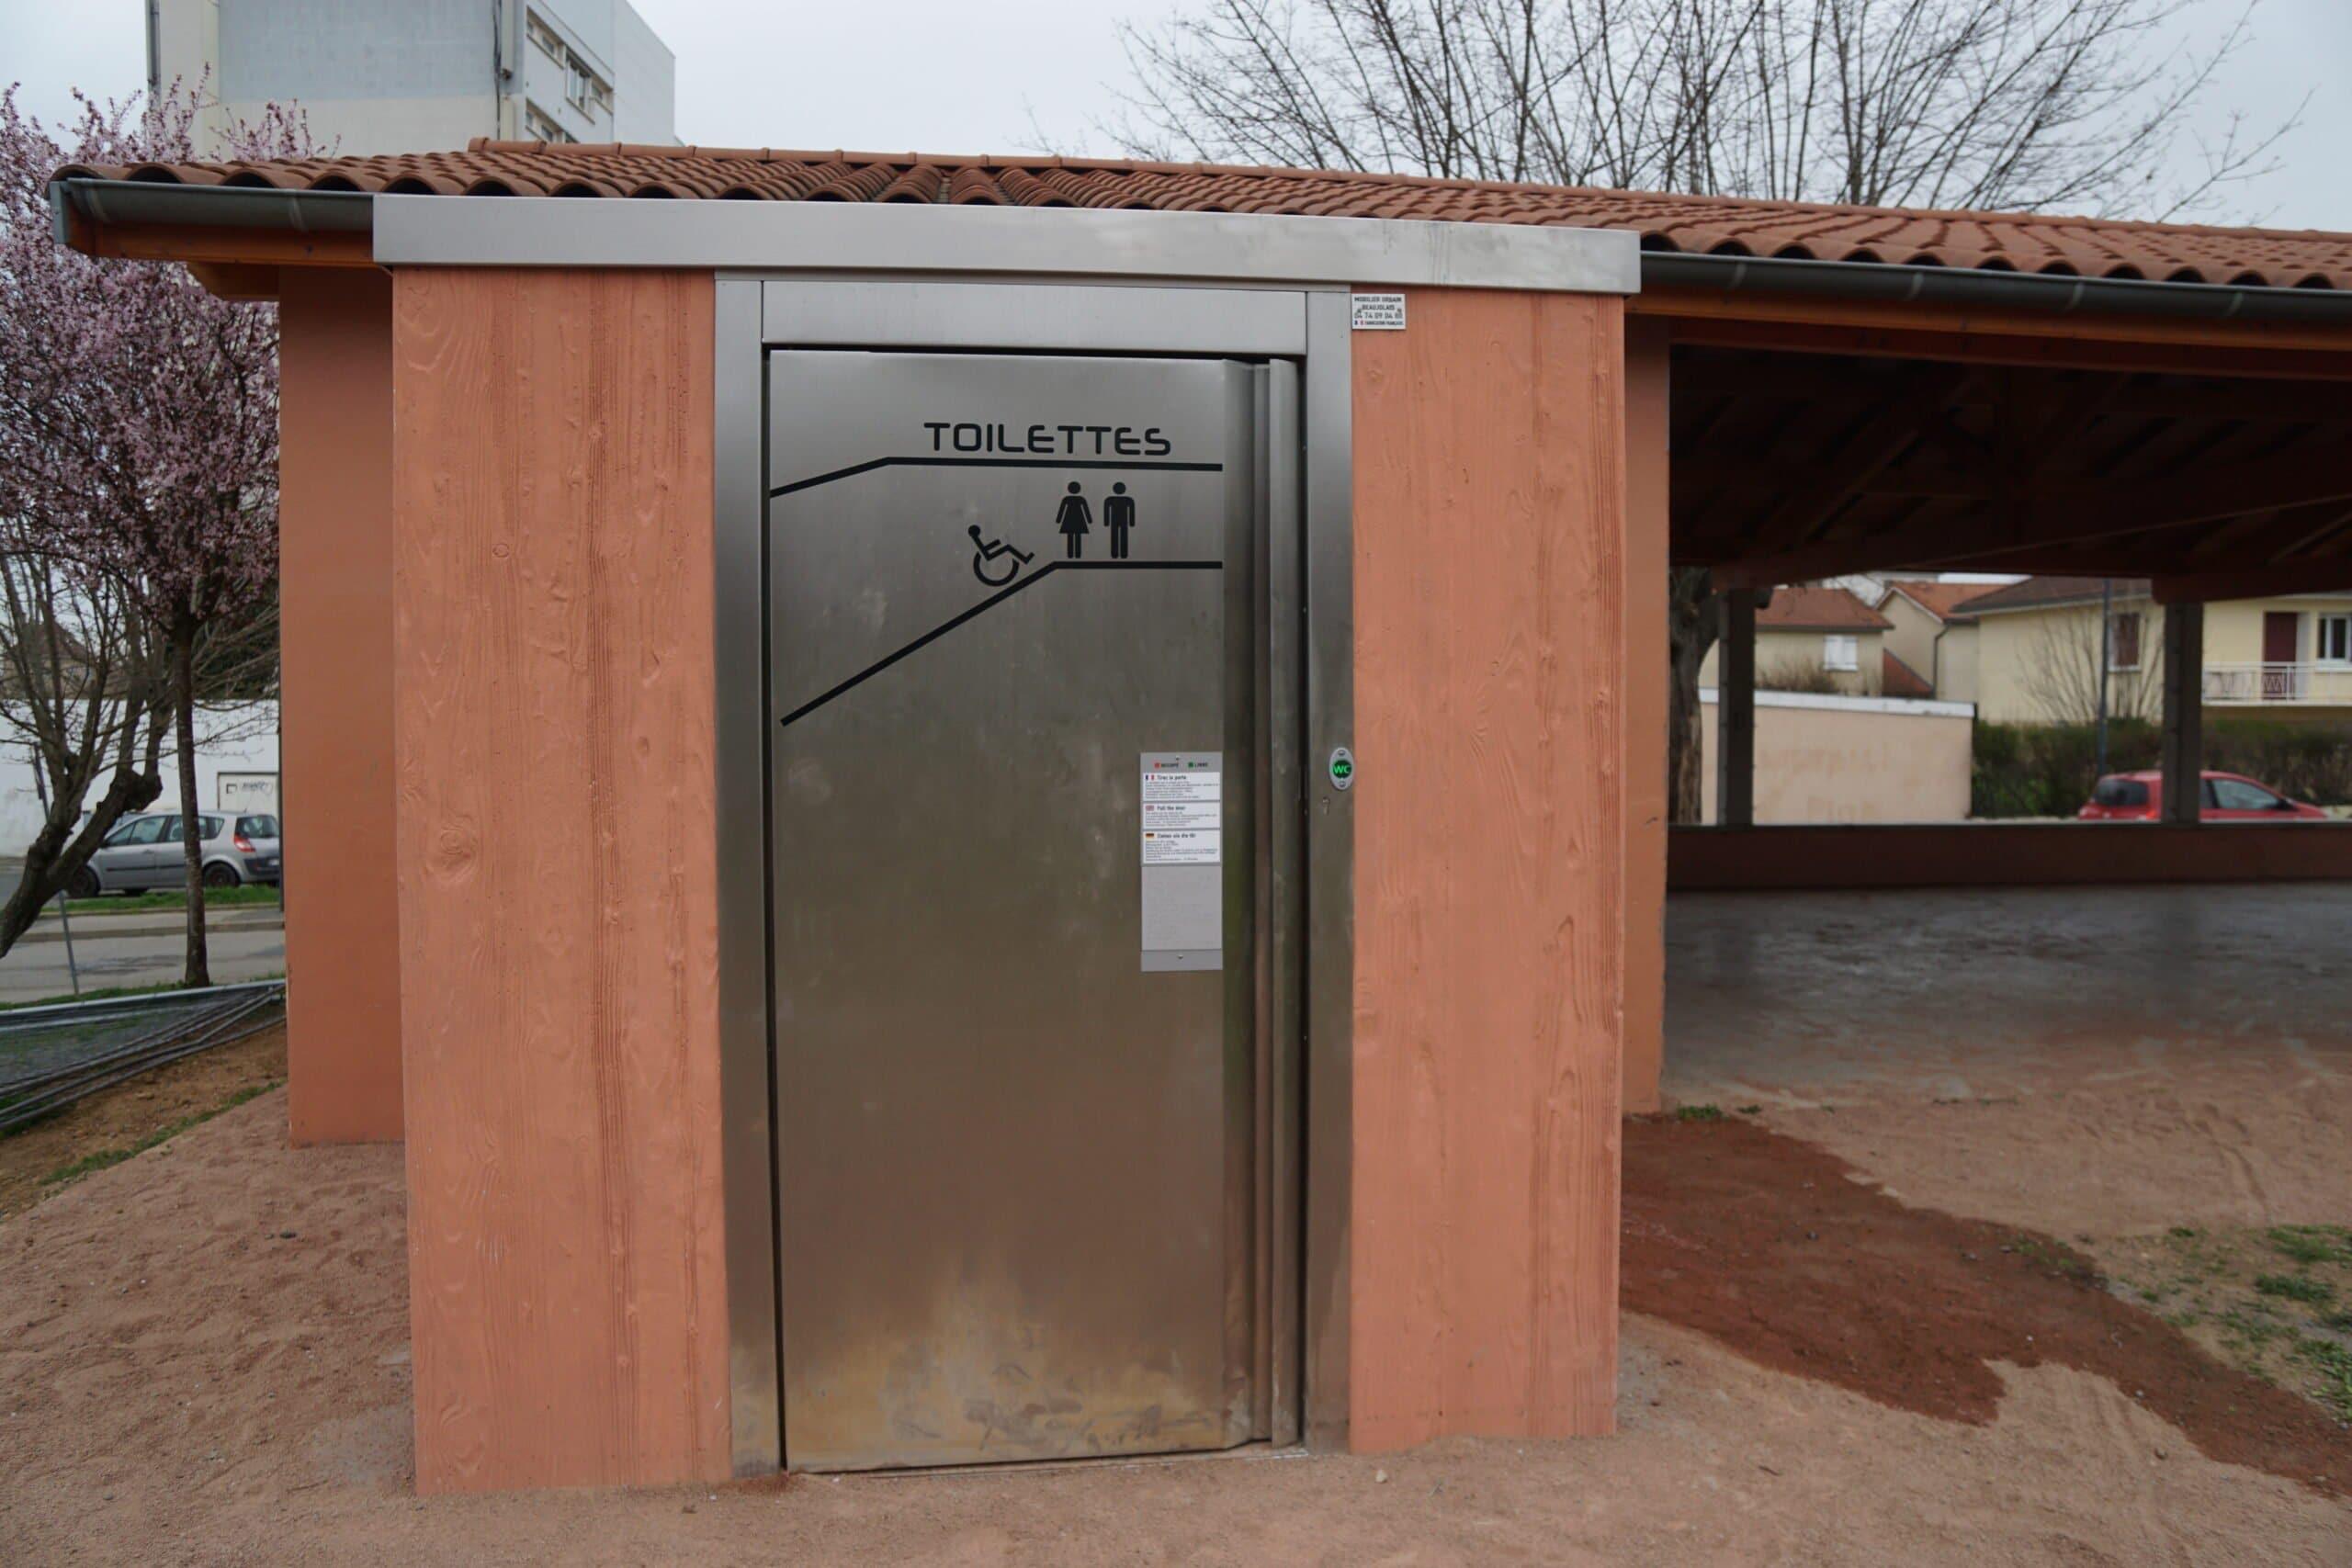 Toilettes esplanade mairie